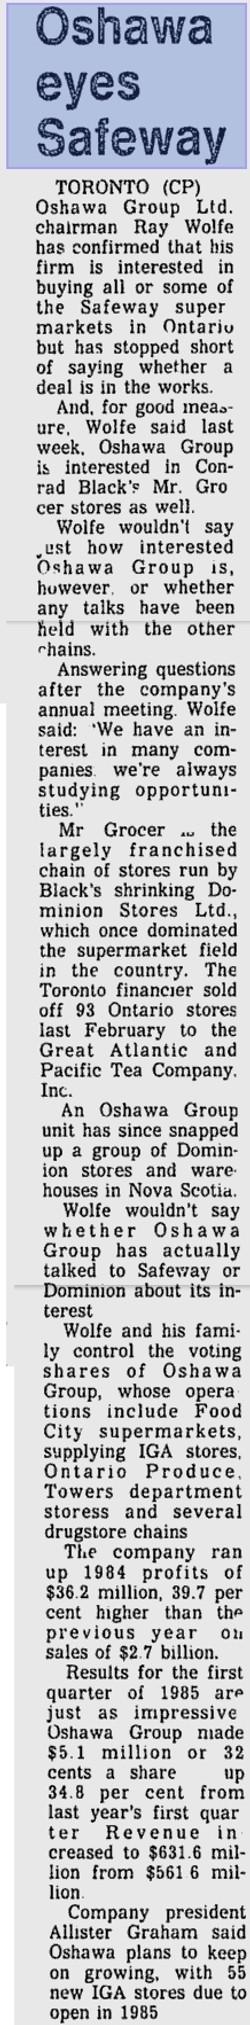 1985_towers_dept_stores_ottawa_citizen_j